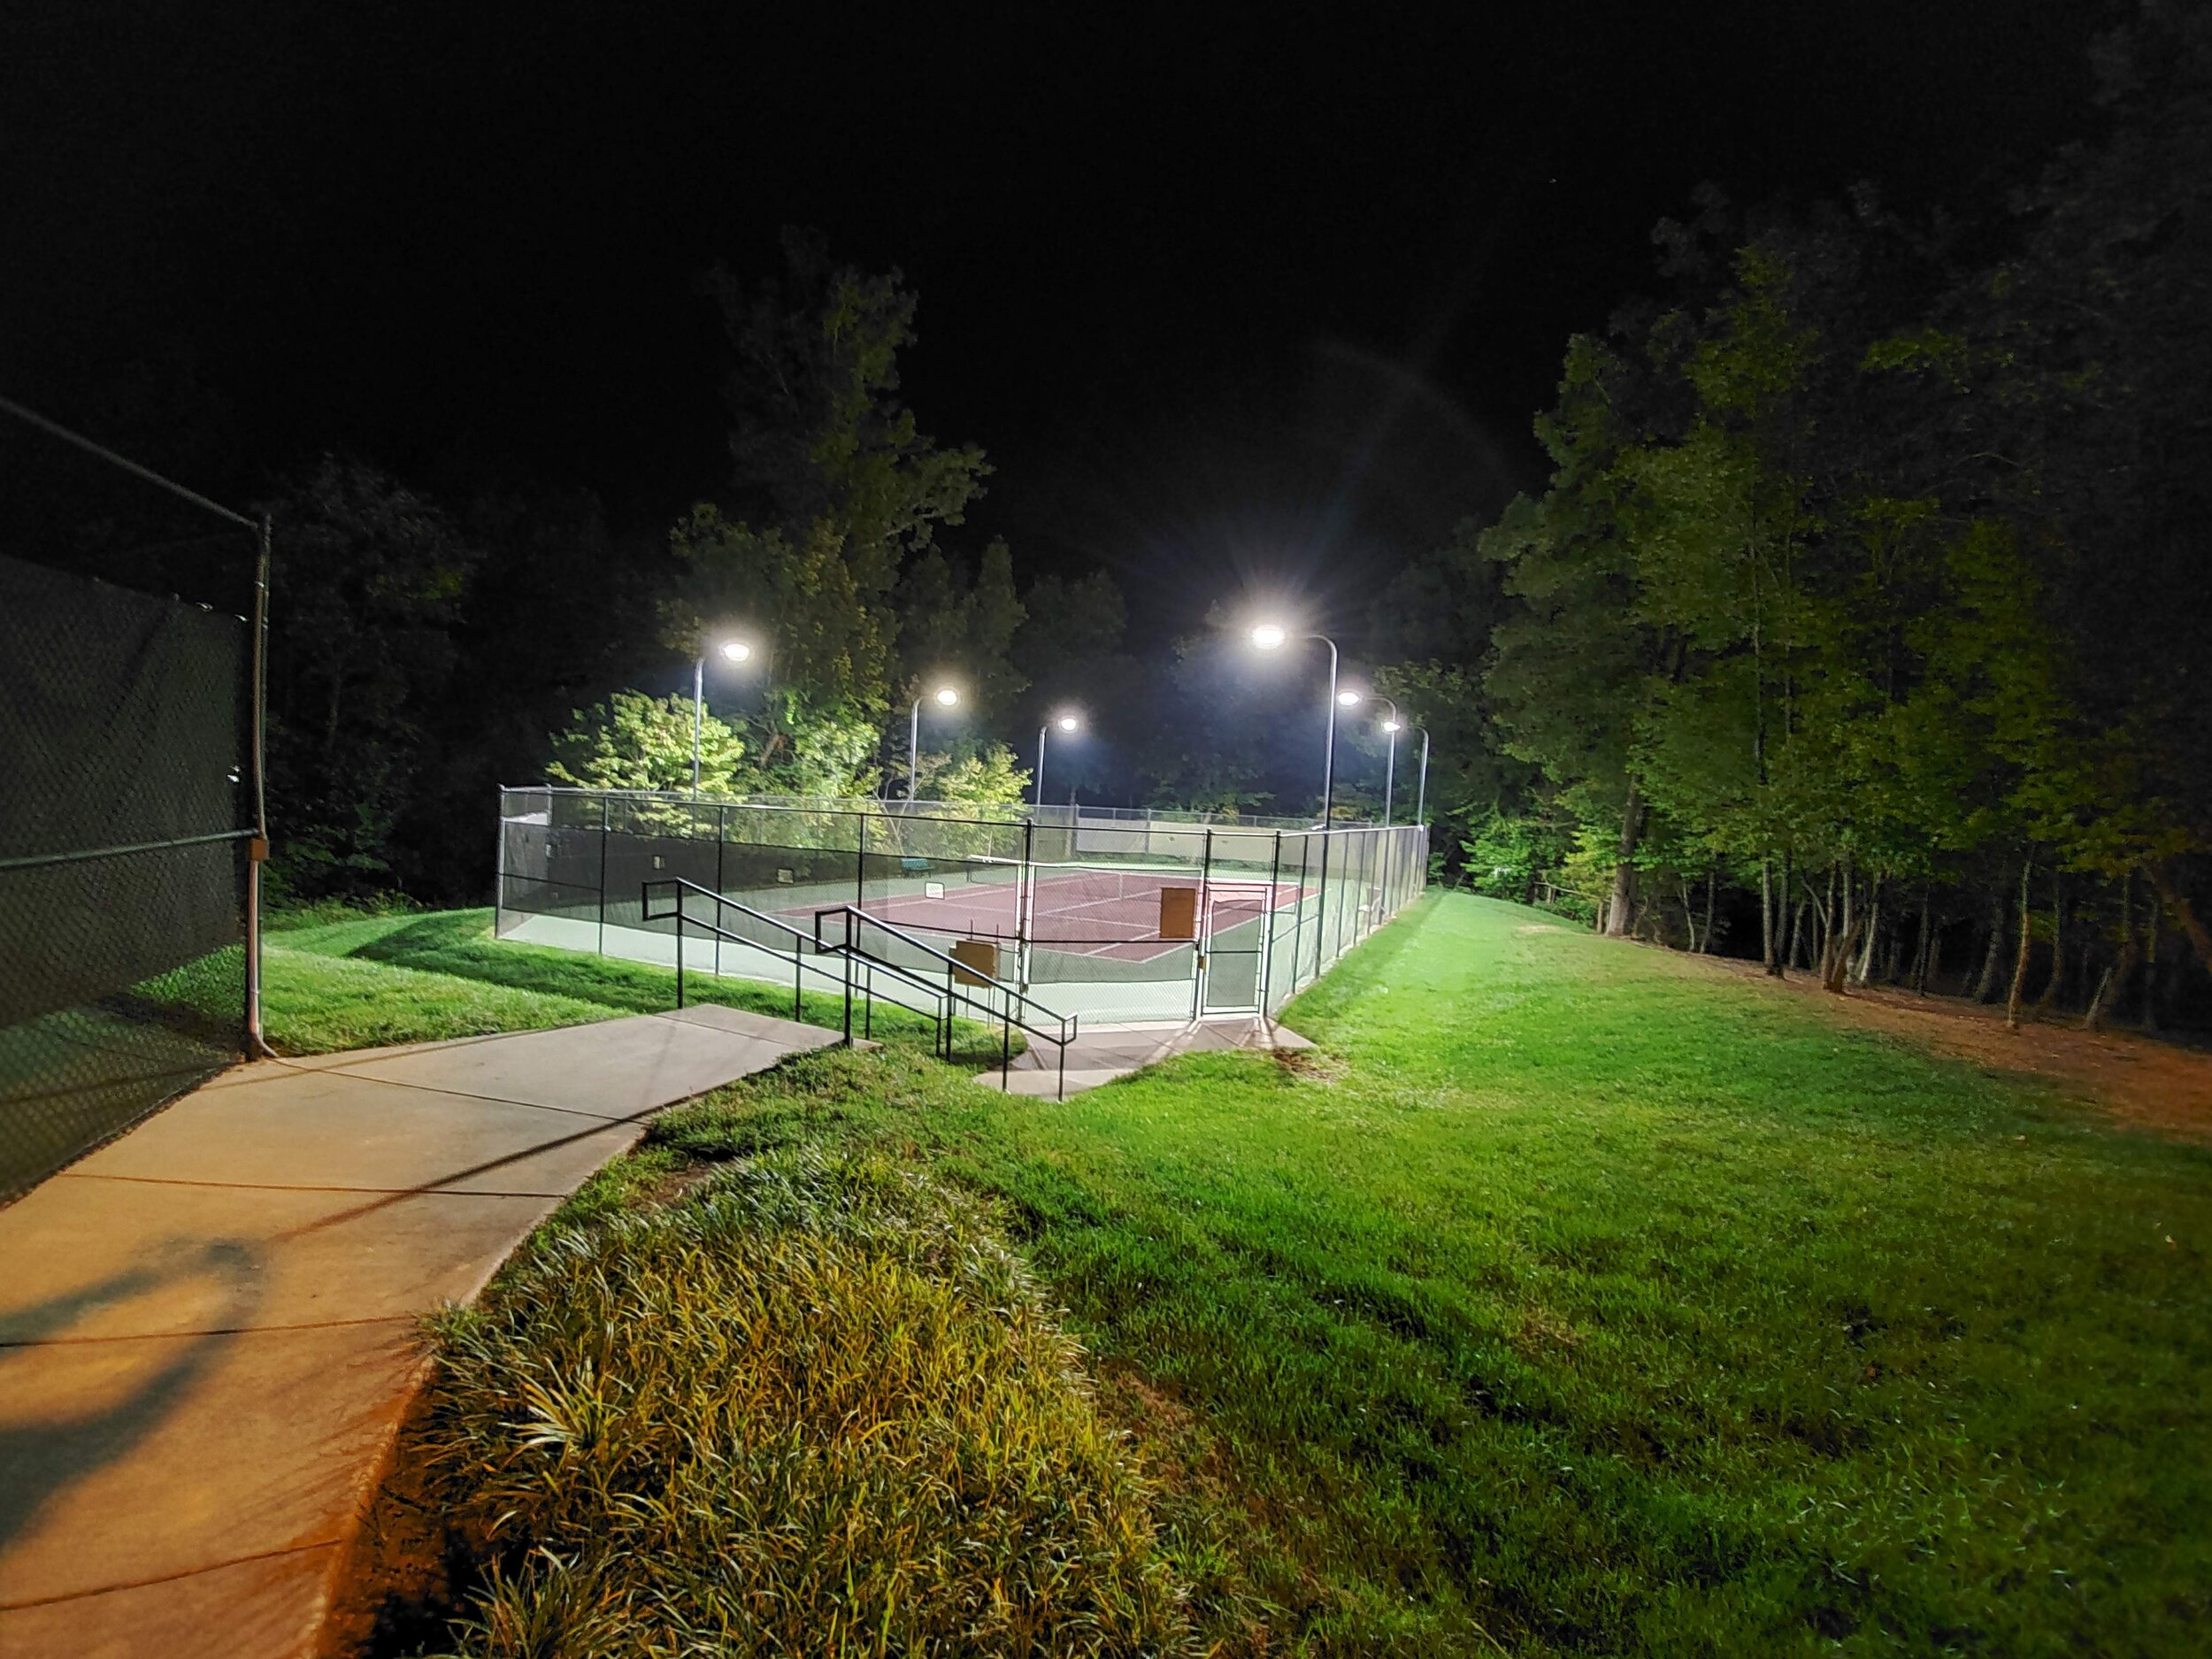 Lawson Tennis Courts (Lower)